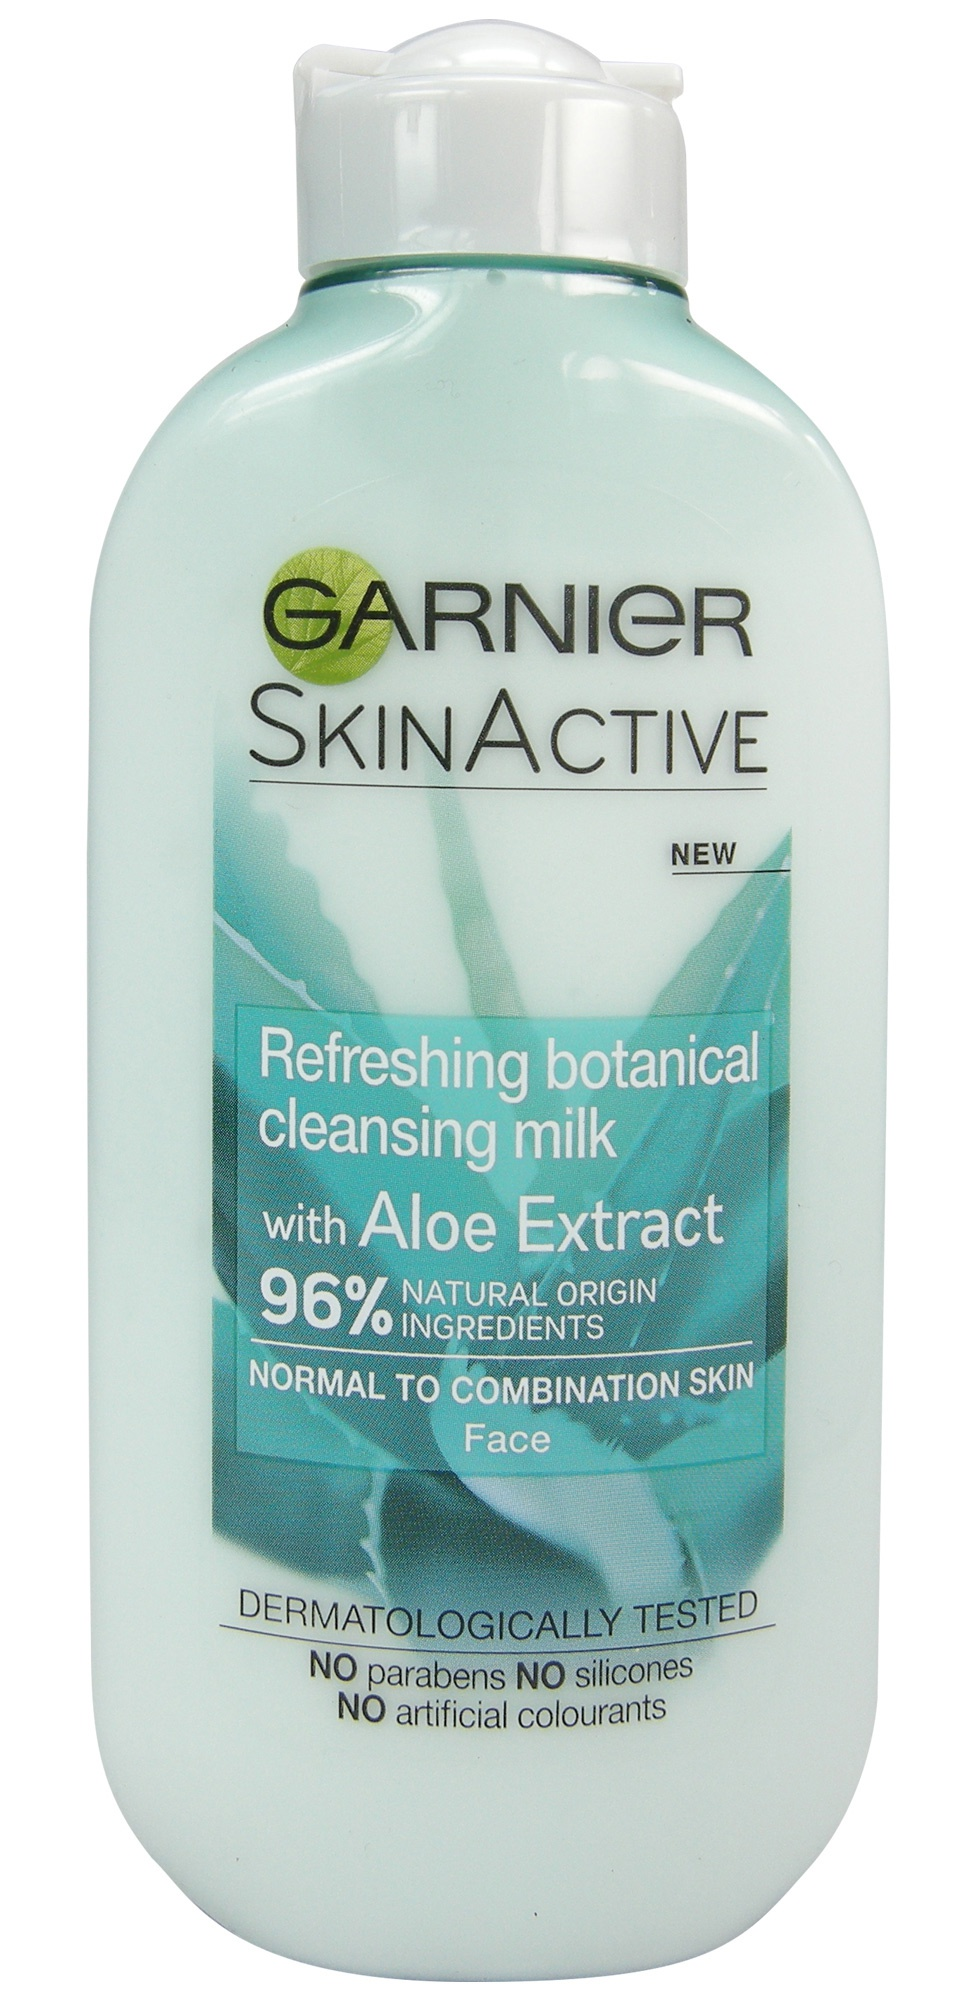 Garnier Skinactive Refreshing Botanical Cleansing Milk With Aloe Extract